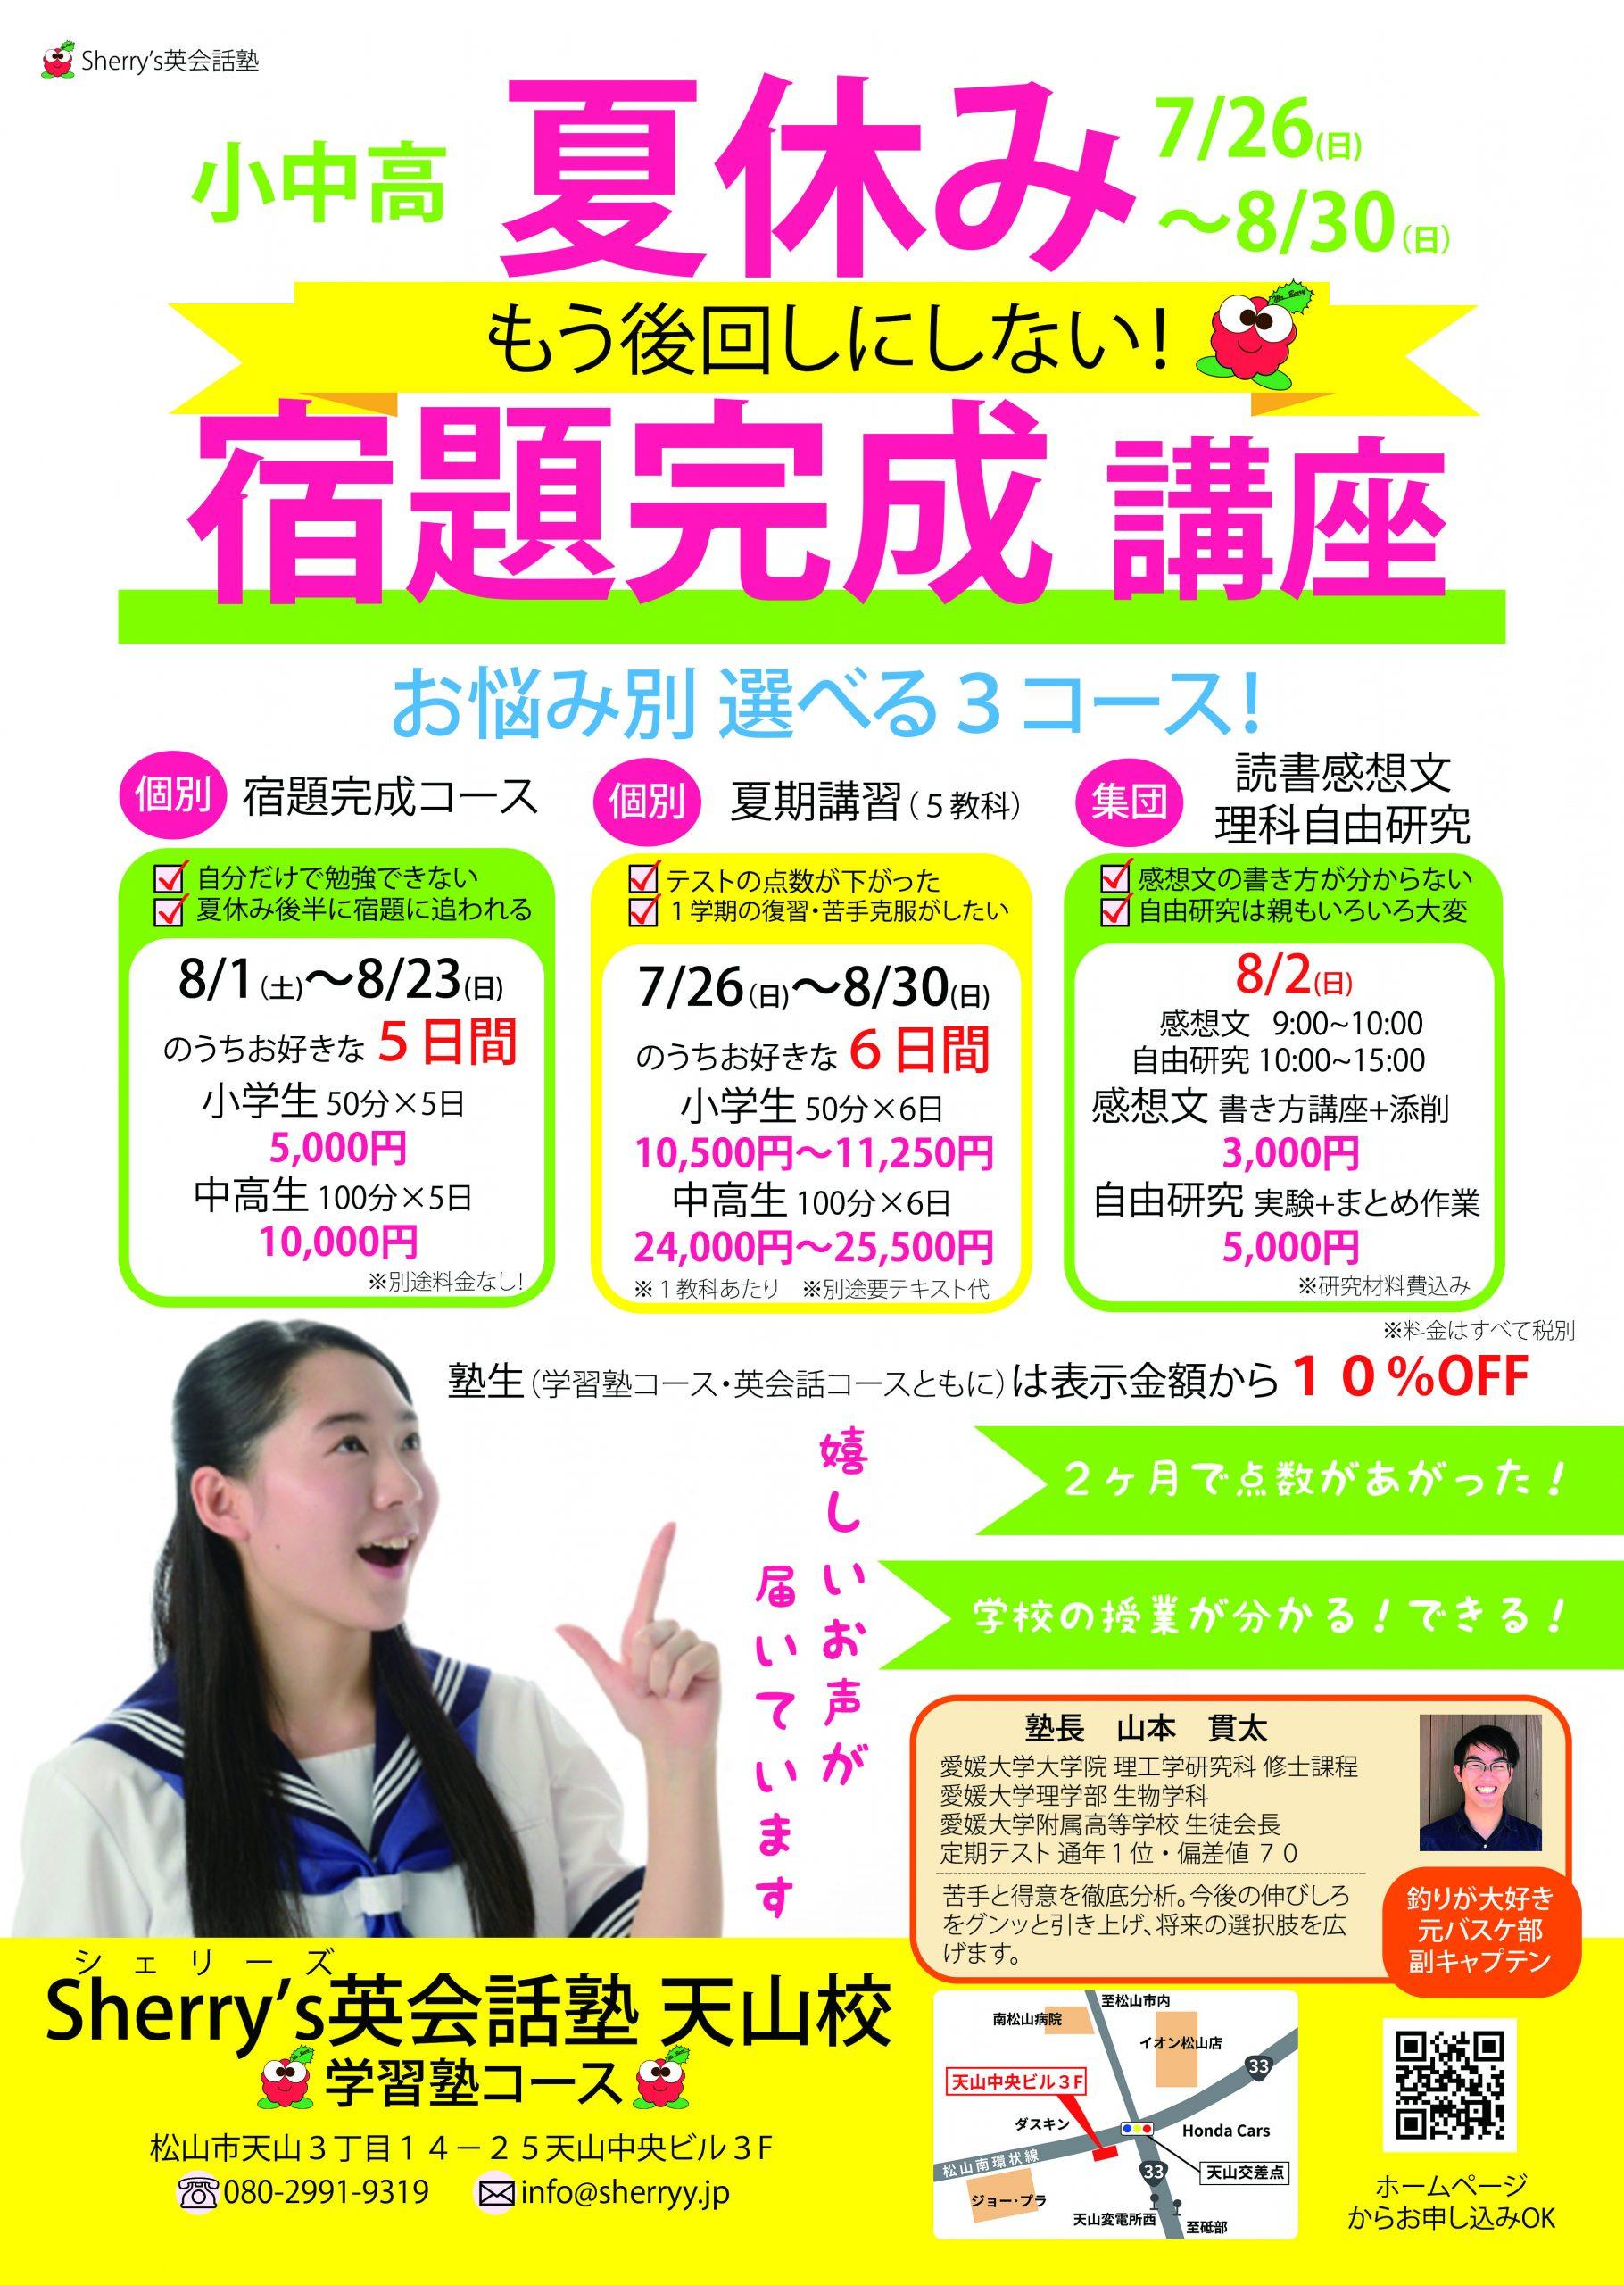 イベント情報:【小学生】理科自由研究・読書感想文書き方講座